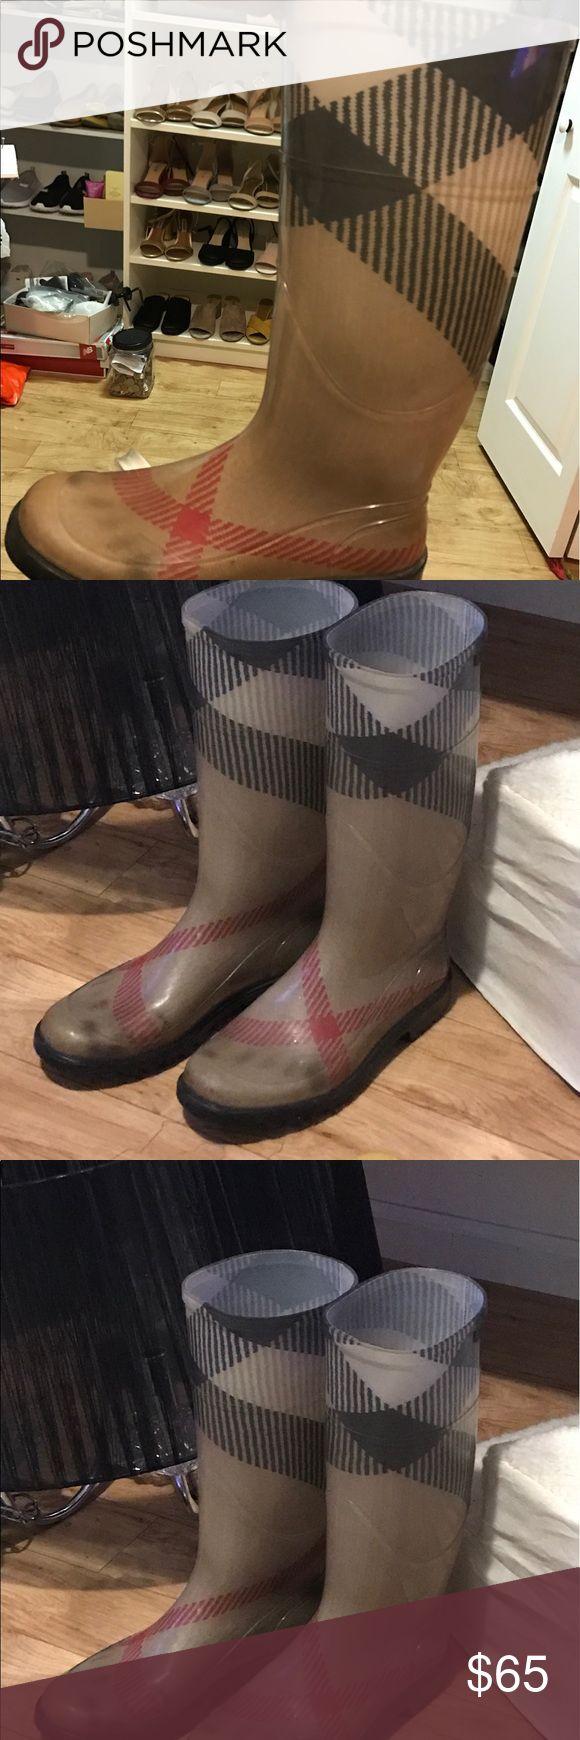 Authentic Burberry rain boots Authentic Burberry boots  sz38 Burberry Shoes Winter & Rain Boots